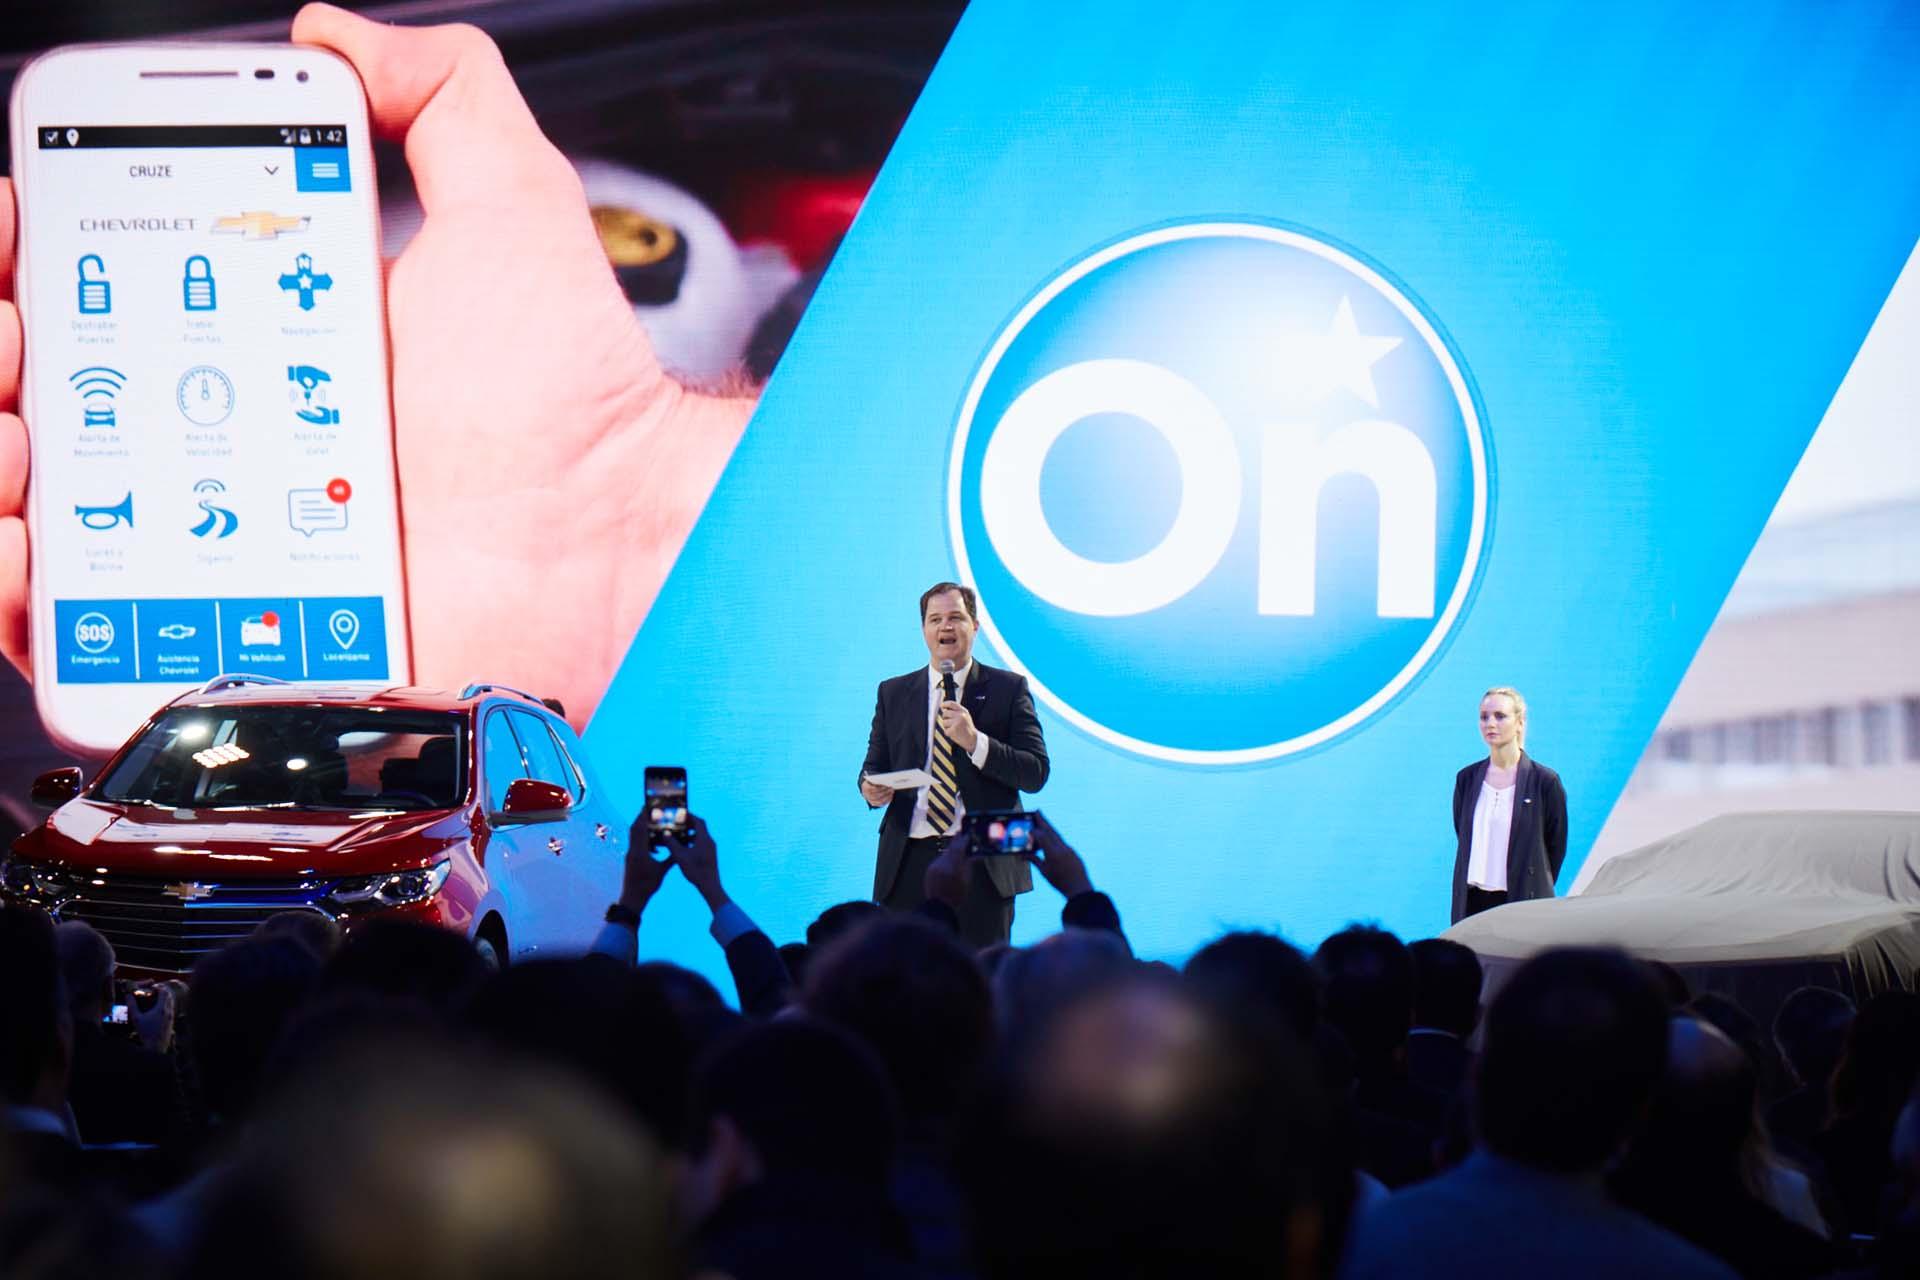 Hermann Mahnke presentando la tecnología OnStar (GM)